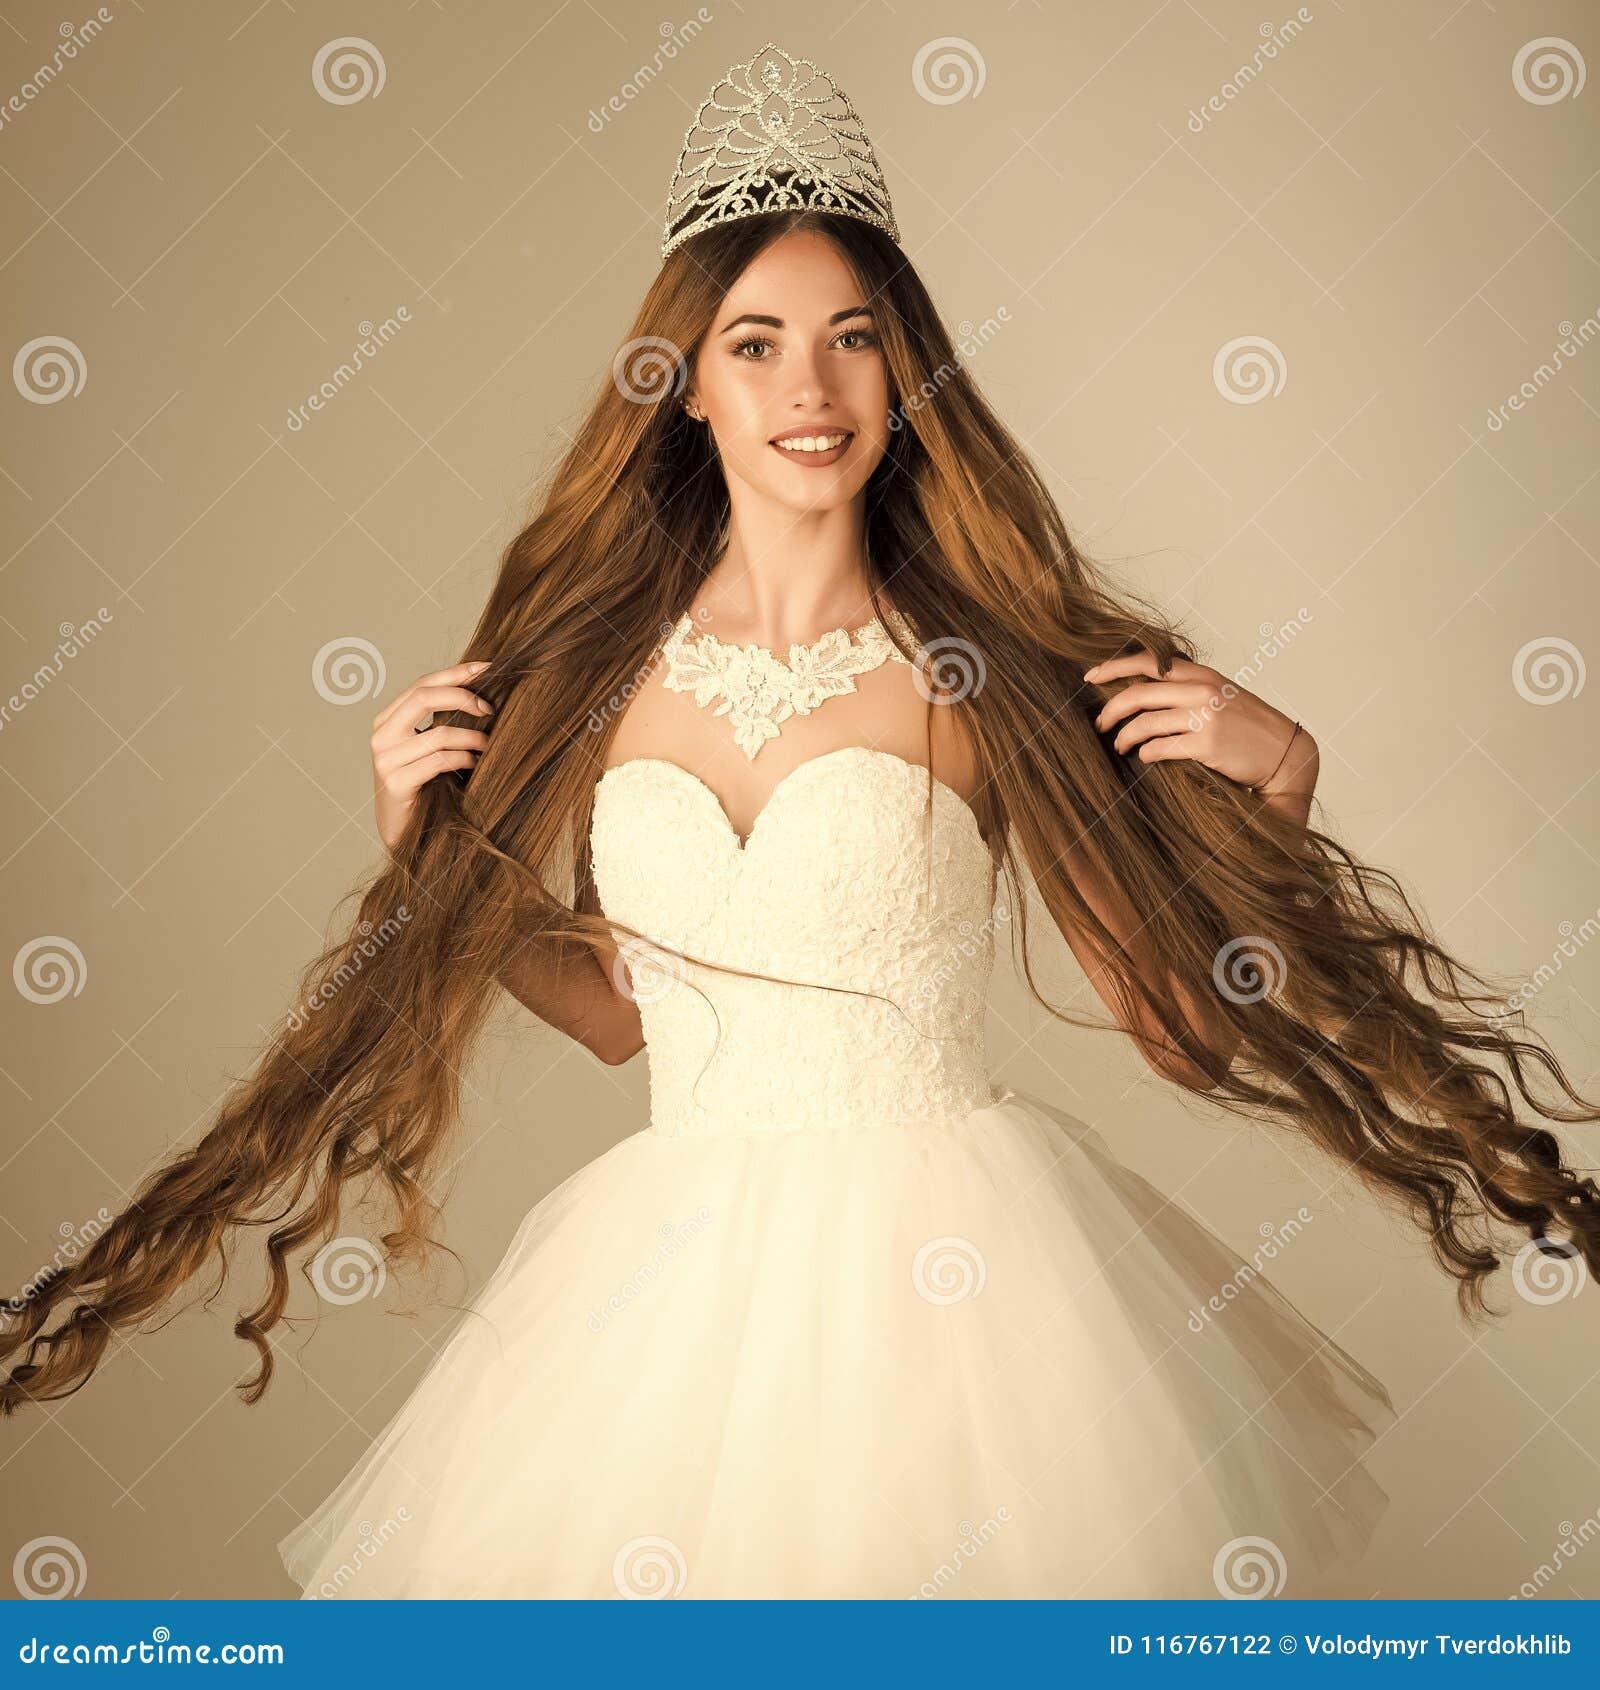 Beauty Salon And Wedding Fashion. Stock Photo